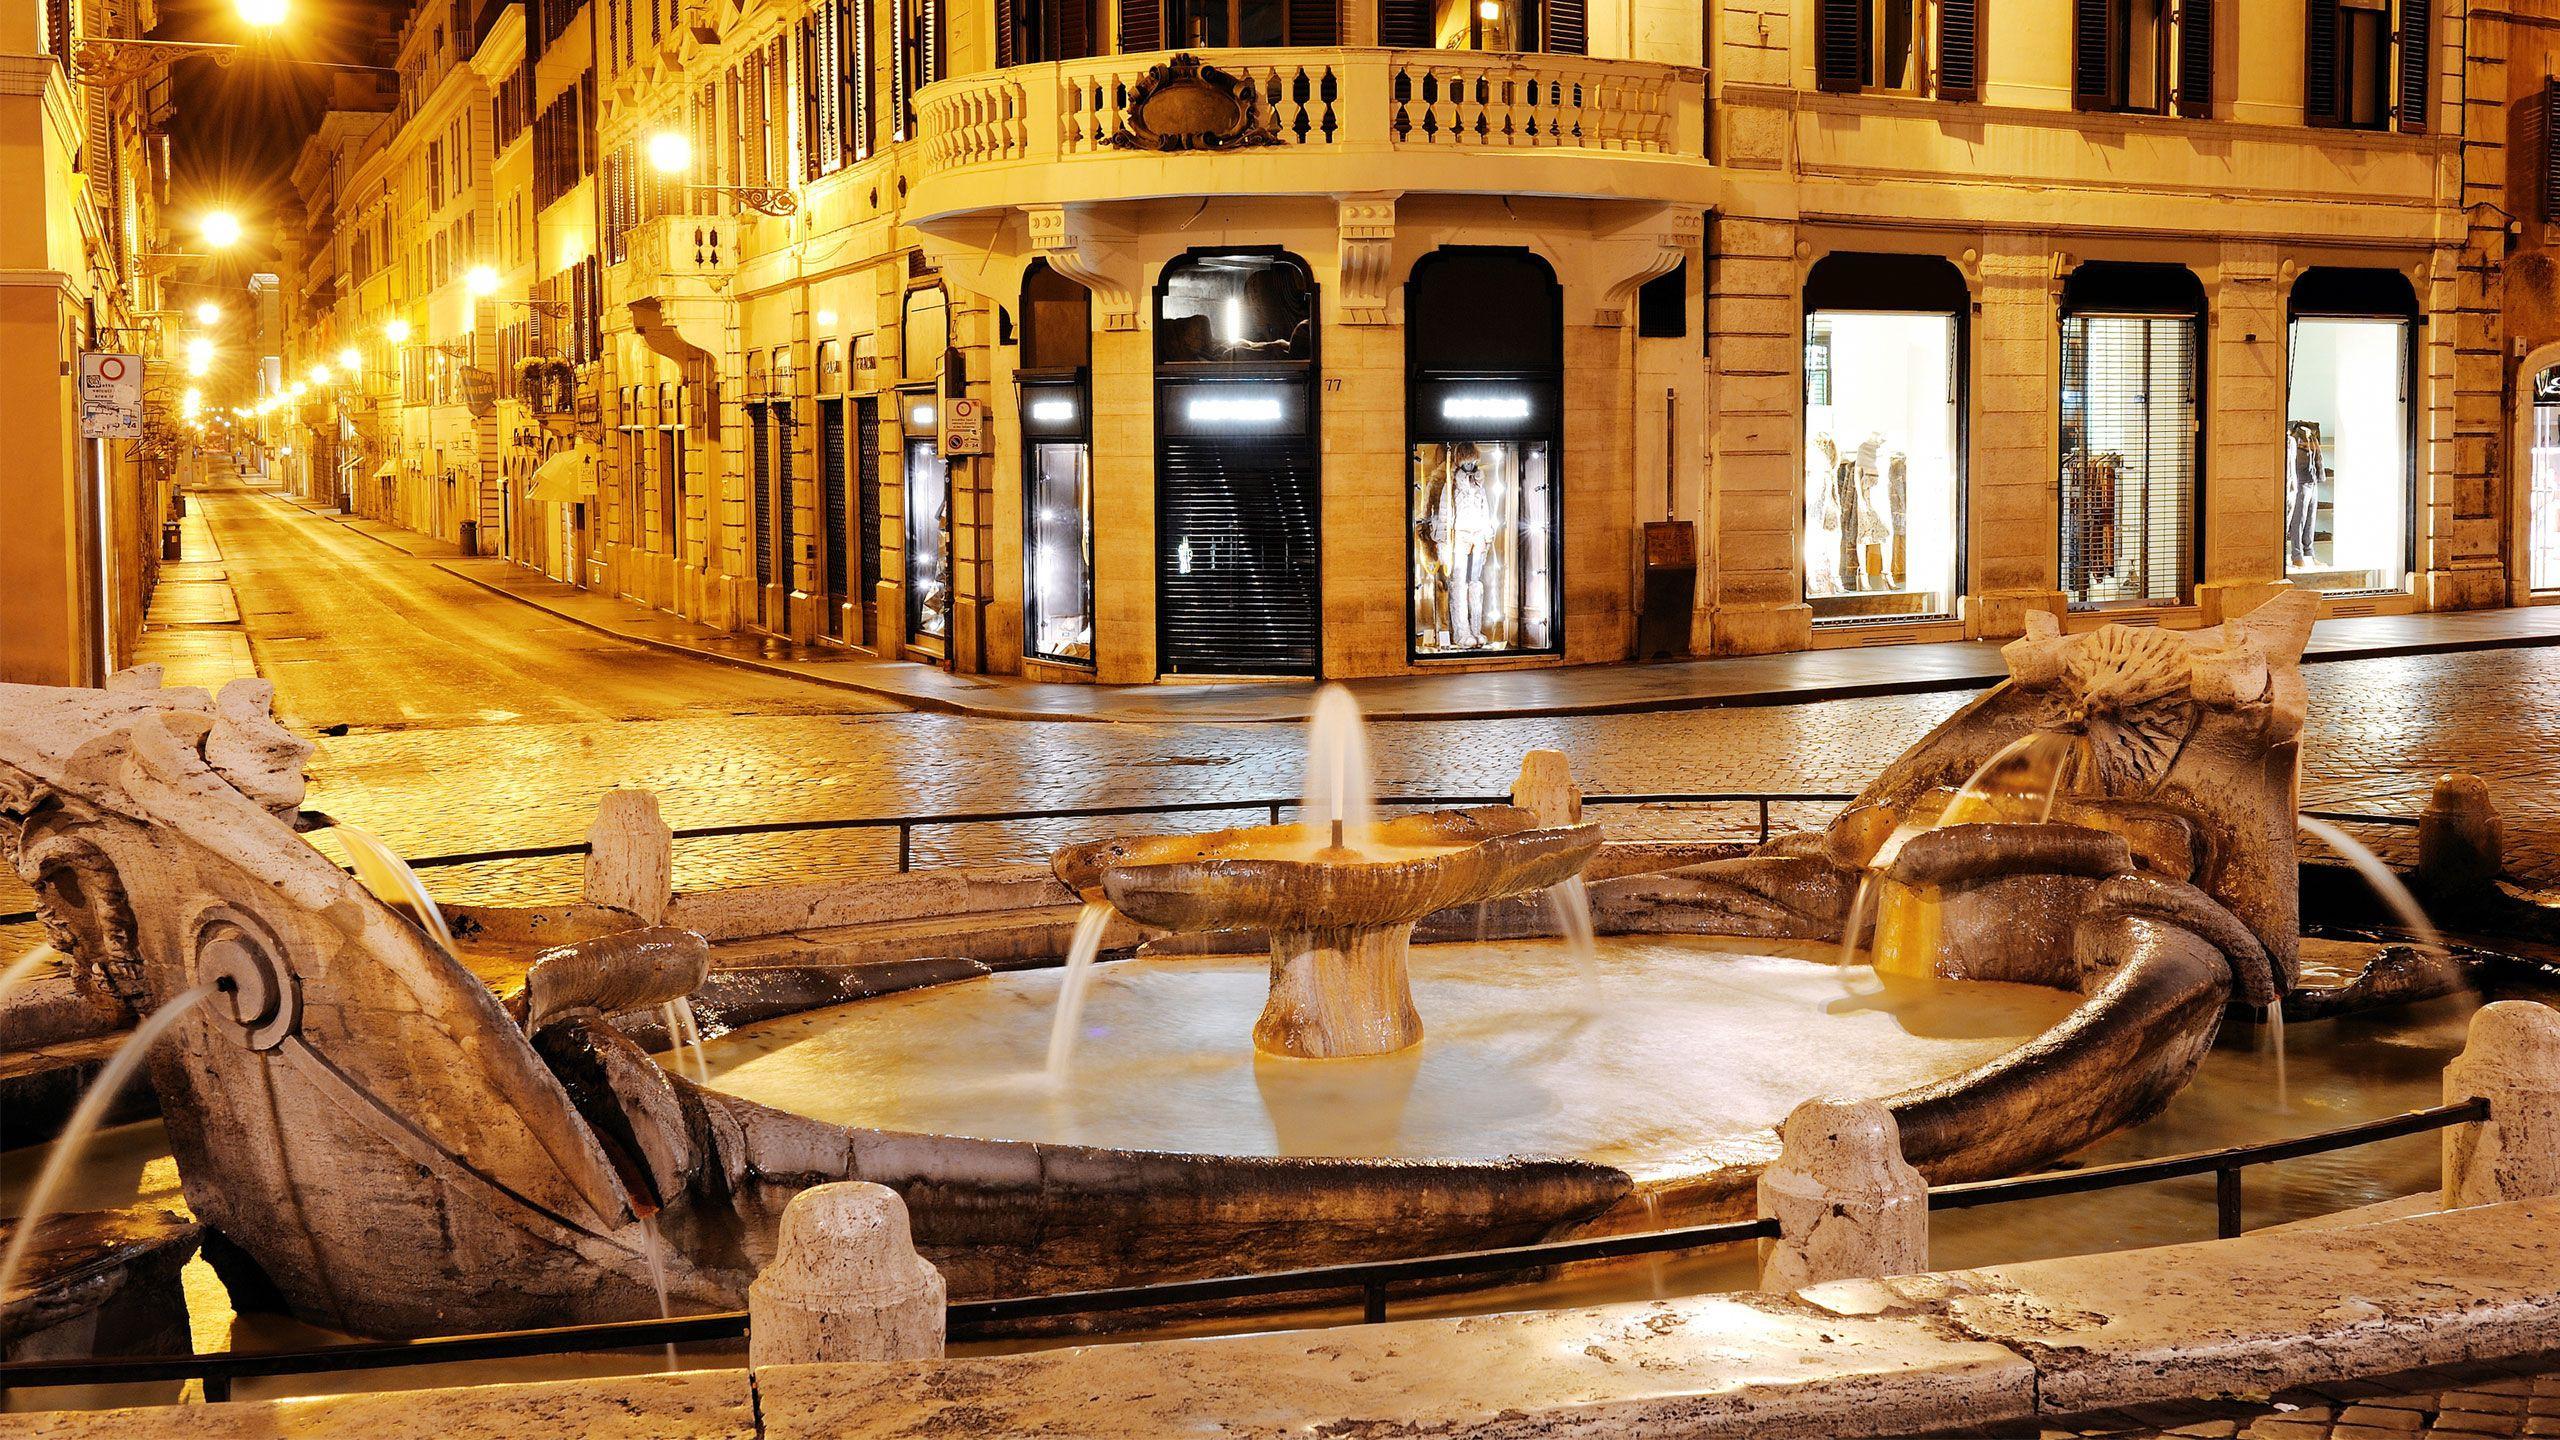 Relais-Condotti-Palace-Roma-Plaza-de-Espana